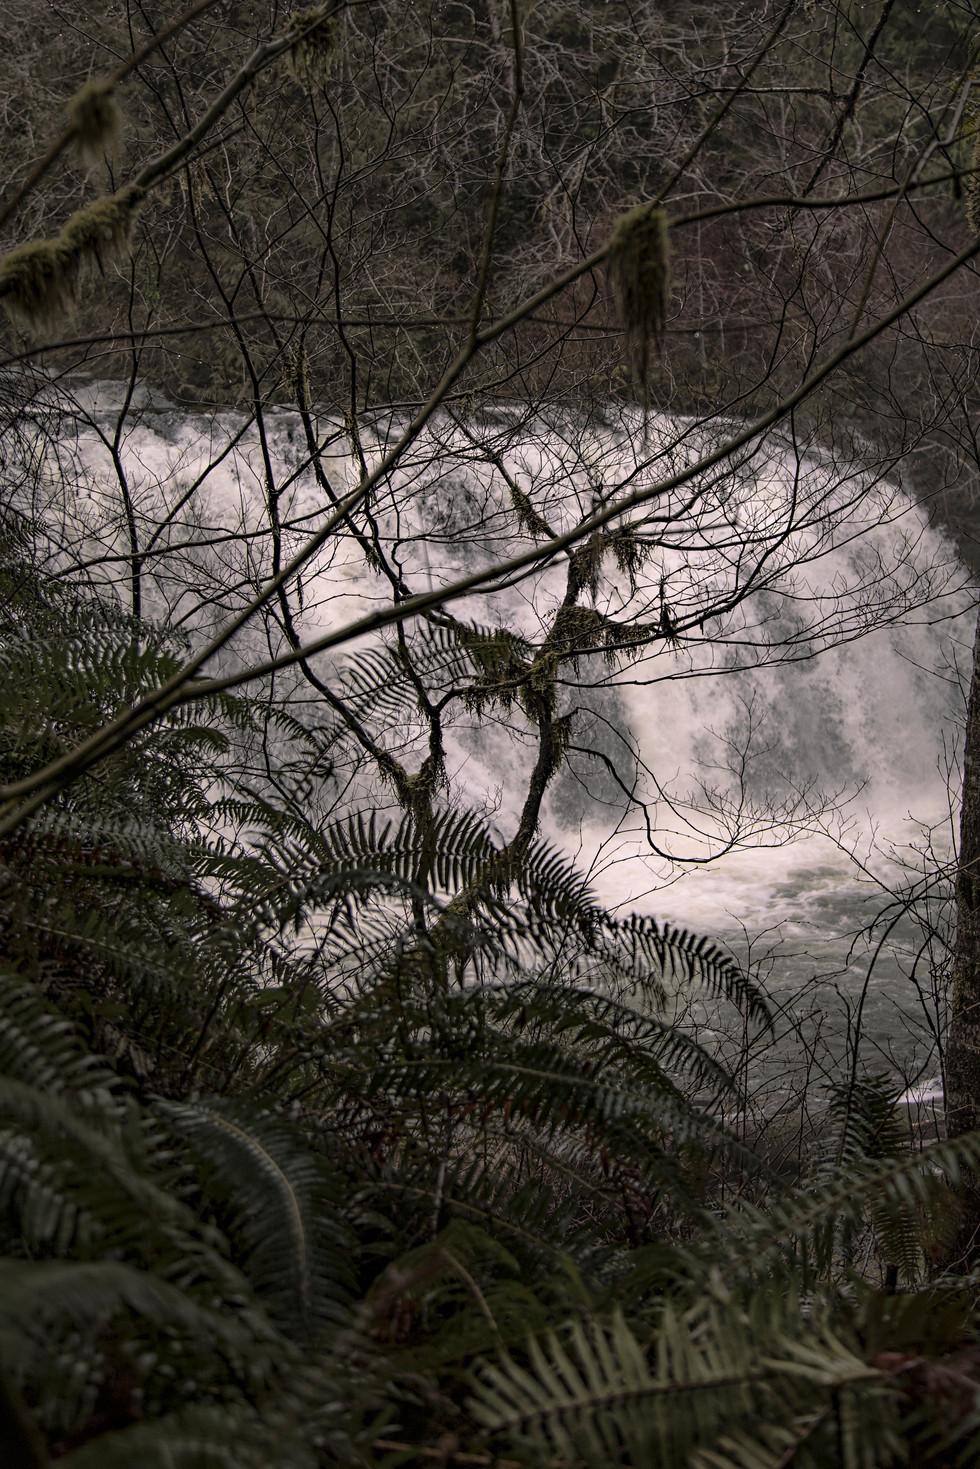 Waterfall, Olympic National Park, WA